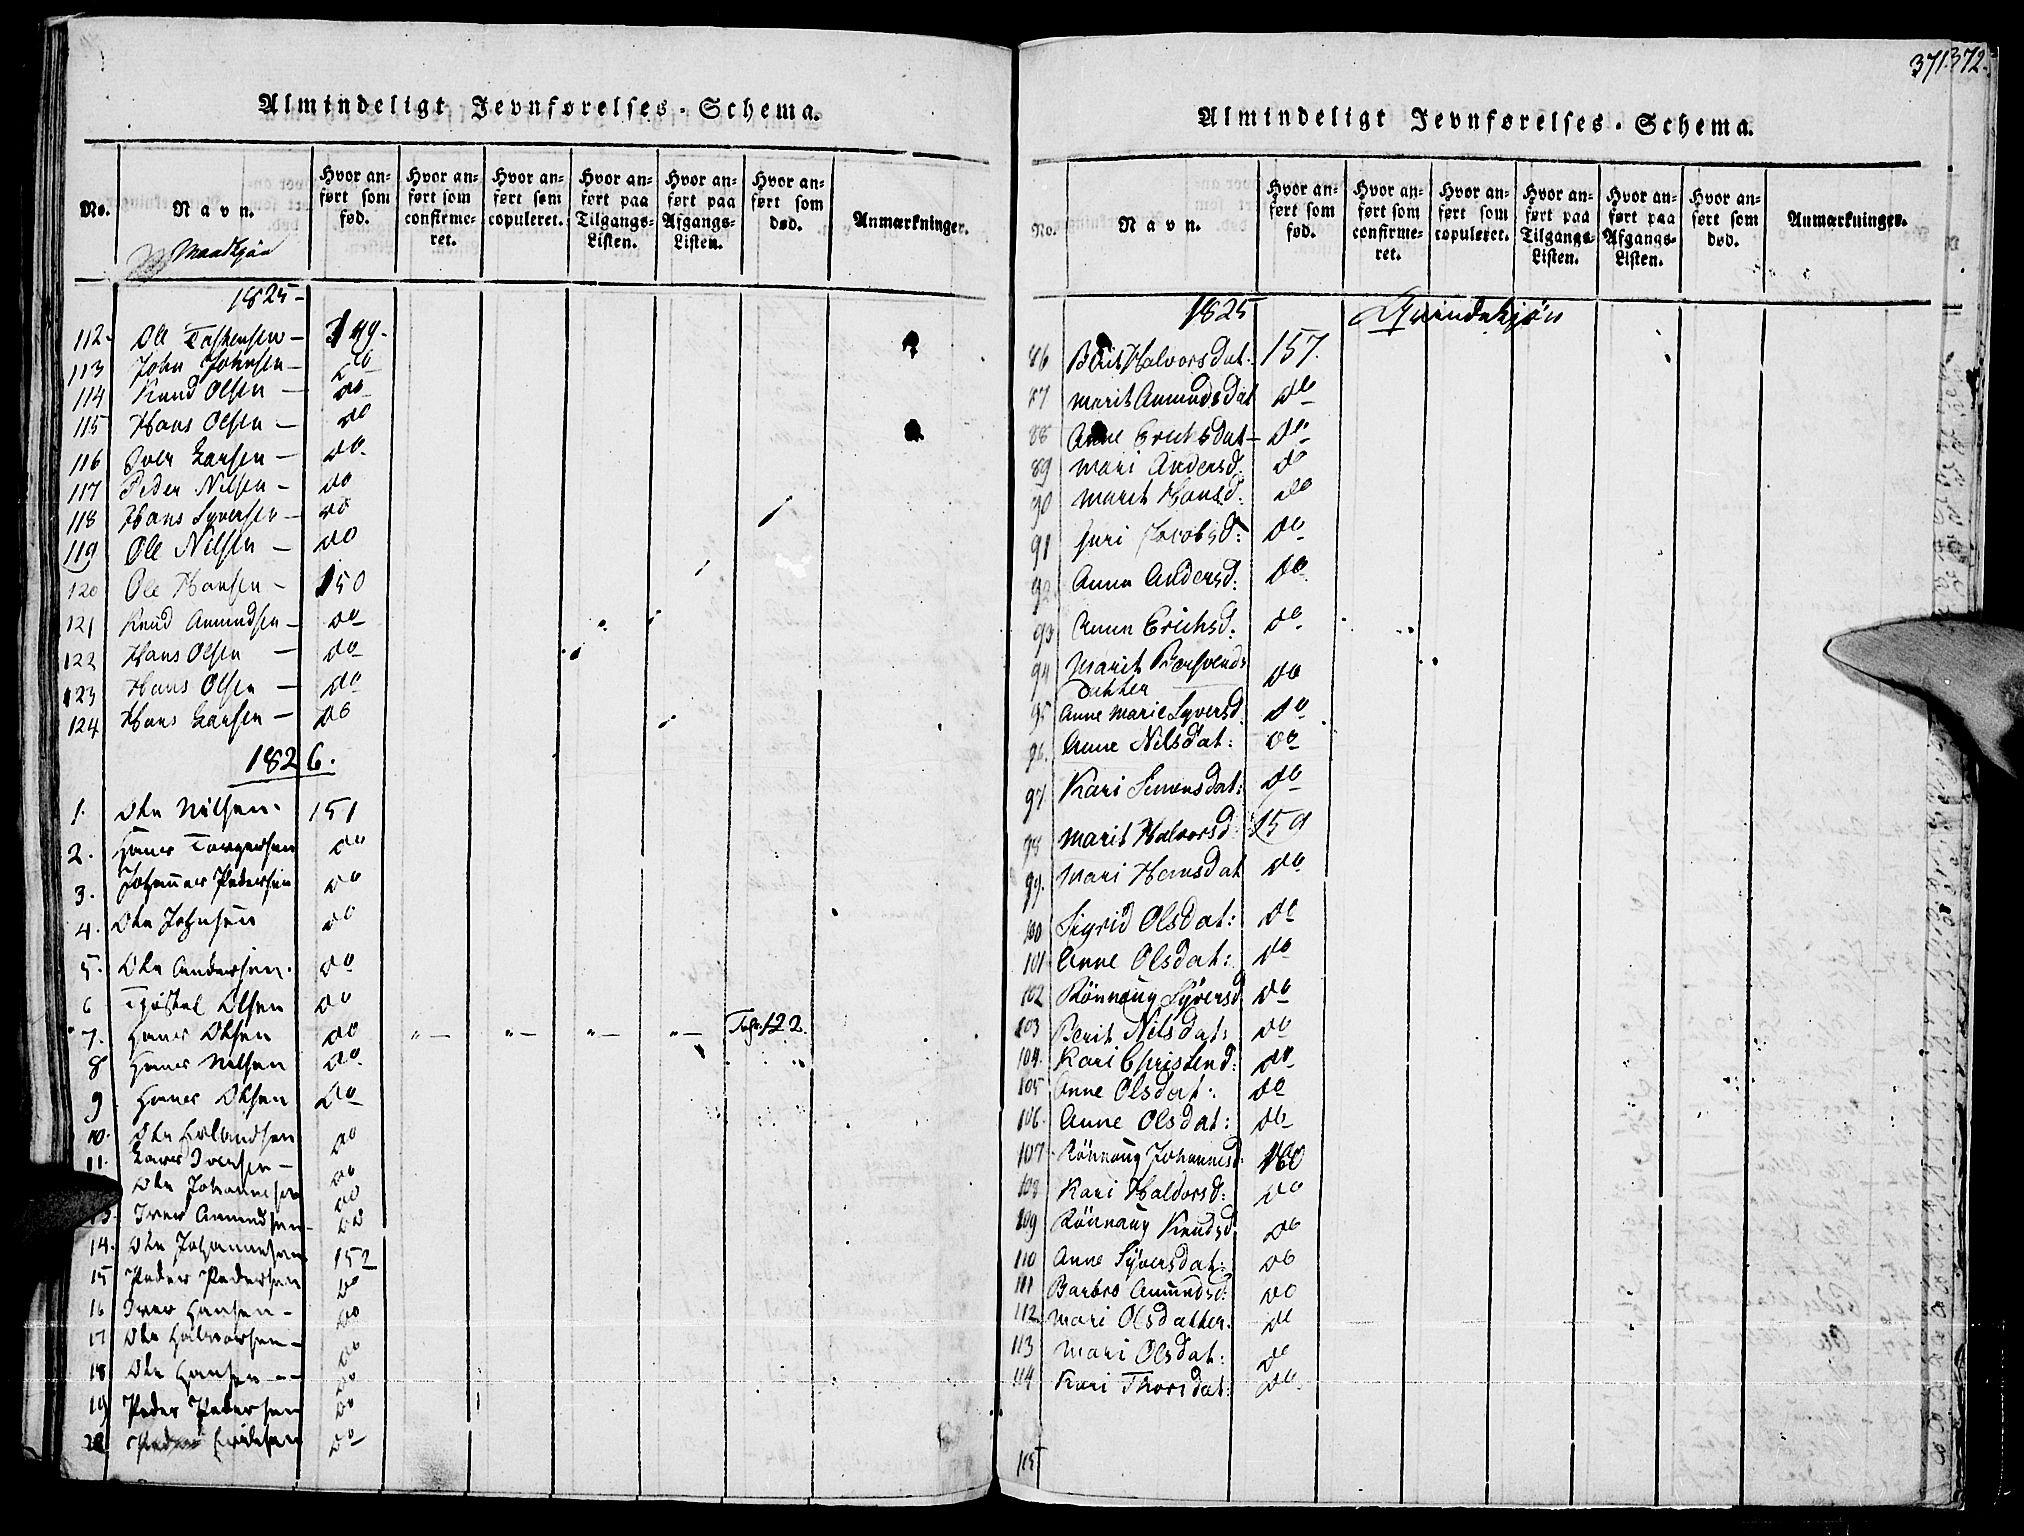 SAH, Fron prestekontor, H/Ha/Haa/L0002: Ministerialbok nr. 2, 1816-1827, s. 371